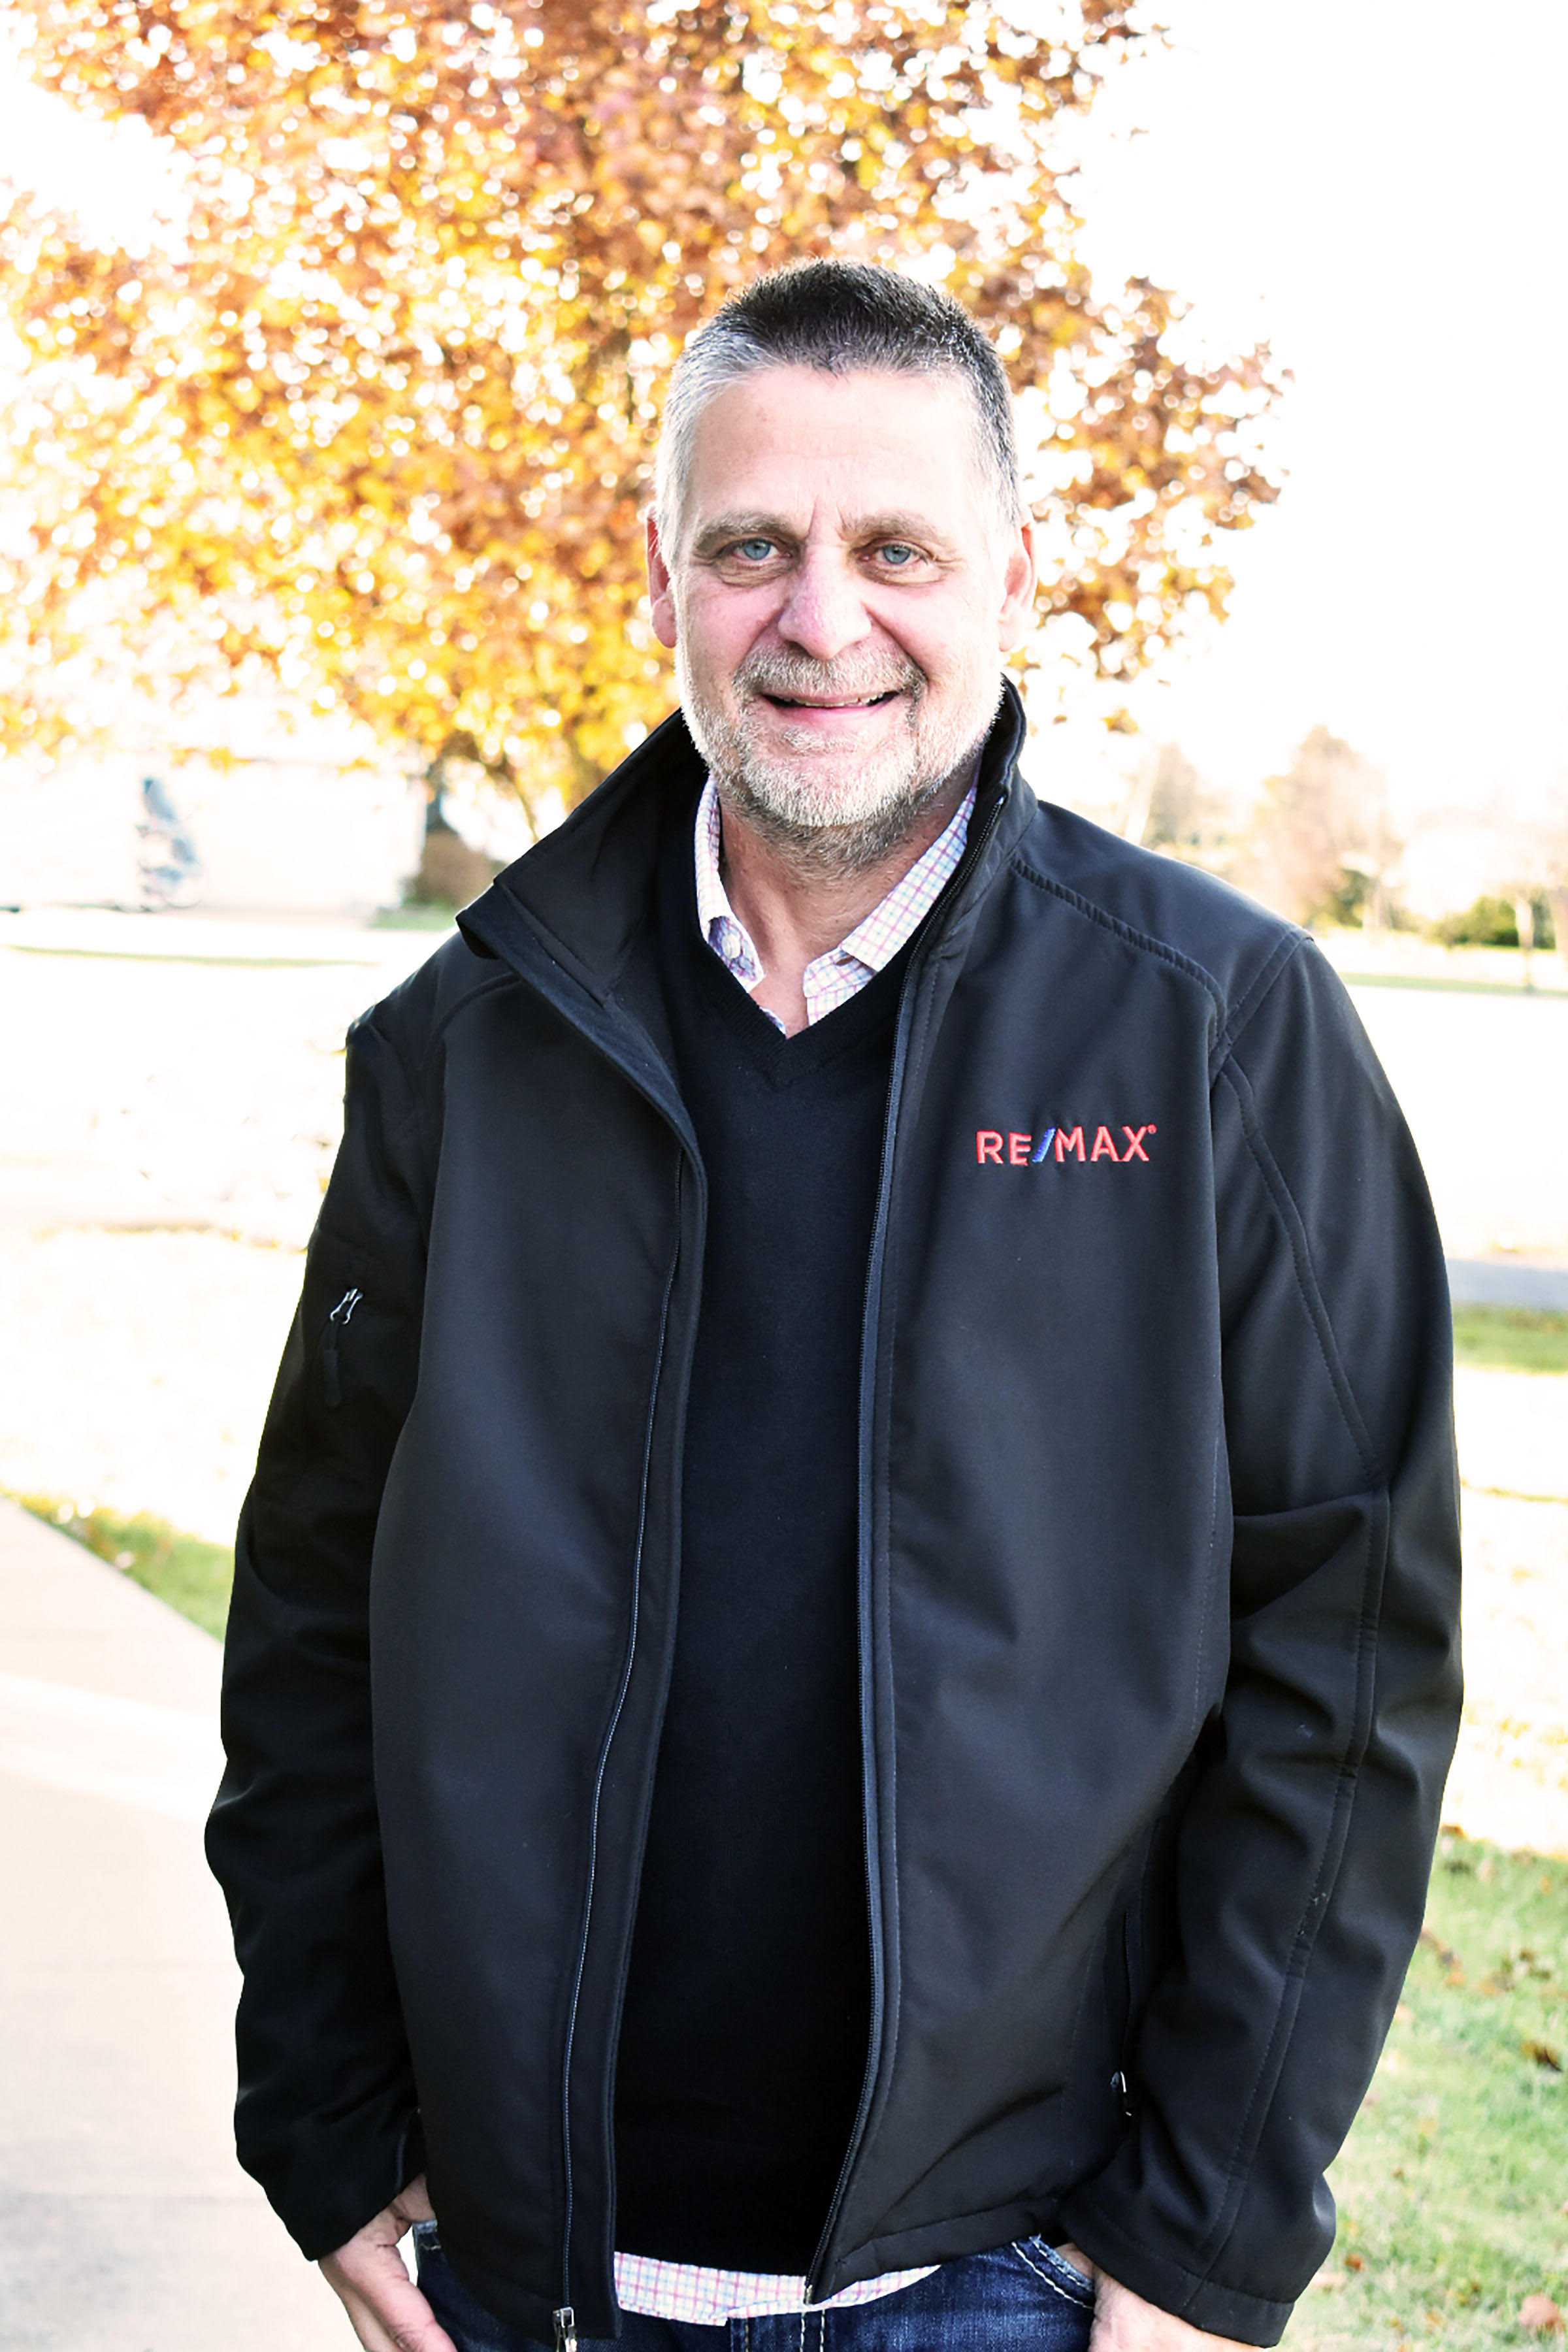 Greg J. Olson